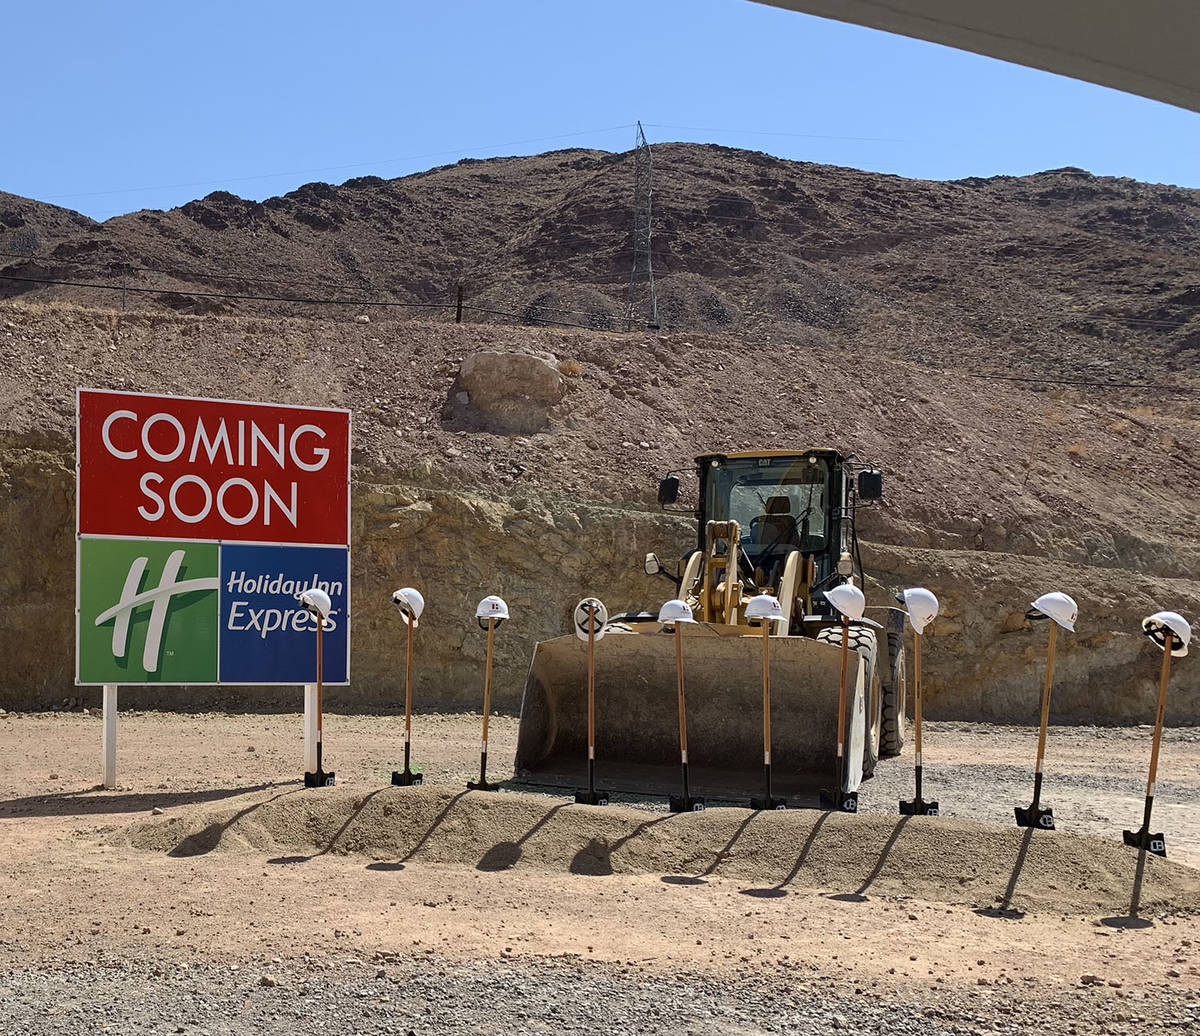 (Hali Bernstein Saylor/Boulder City Review) Shovels await a ceremonial groundbreaking at the Ra ...